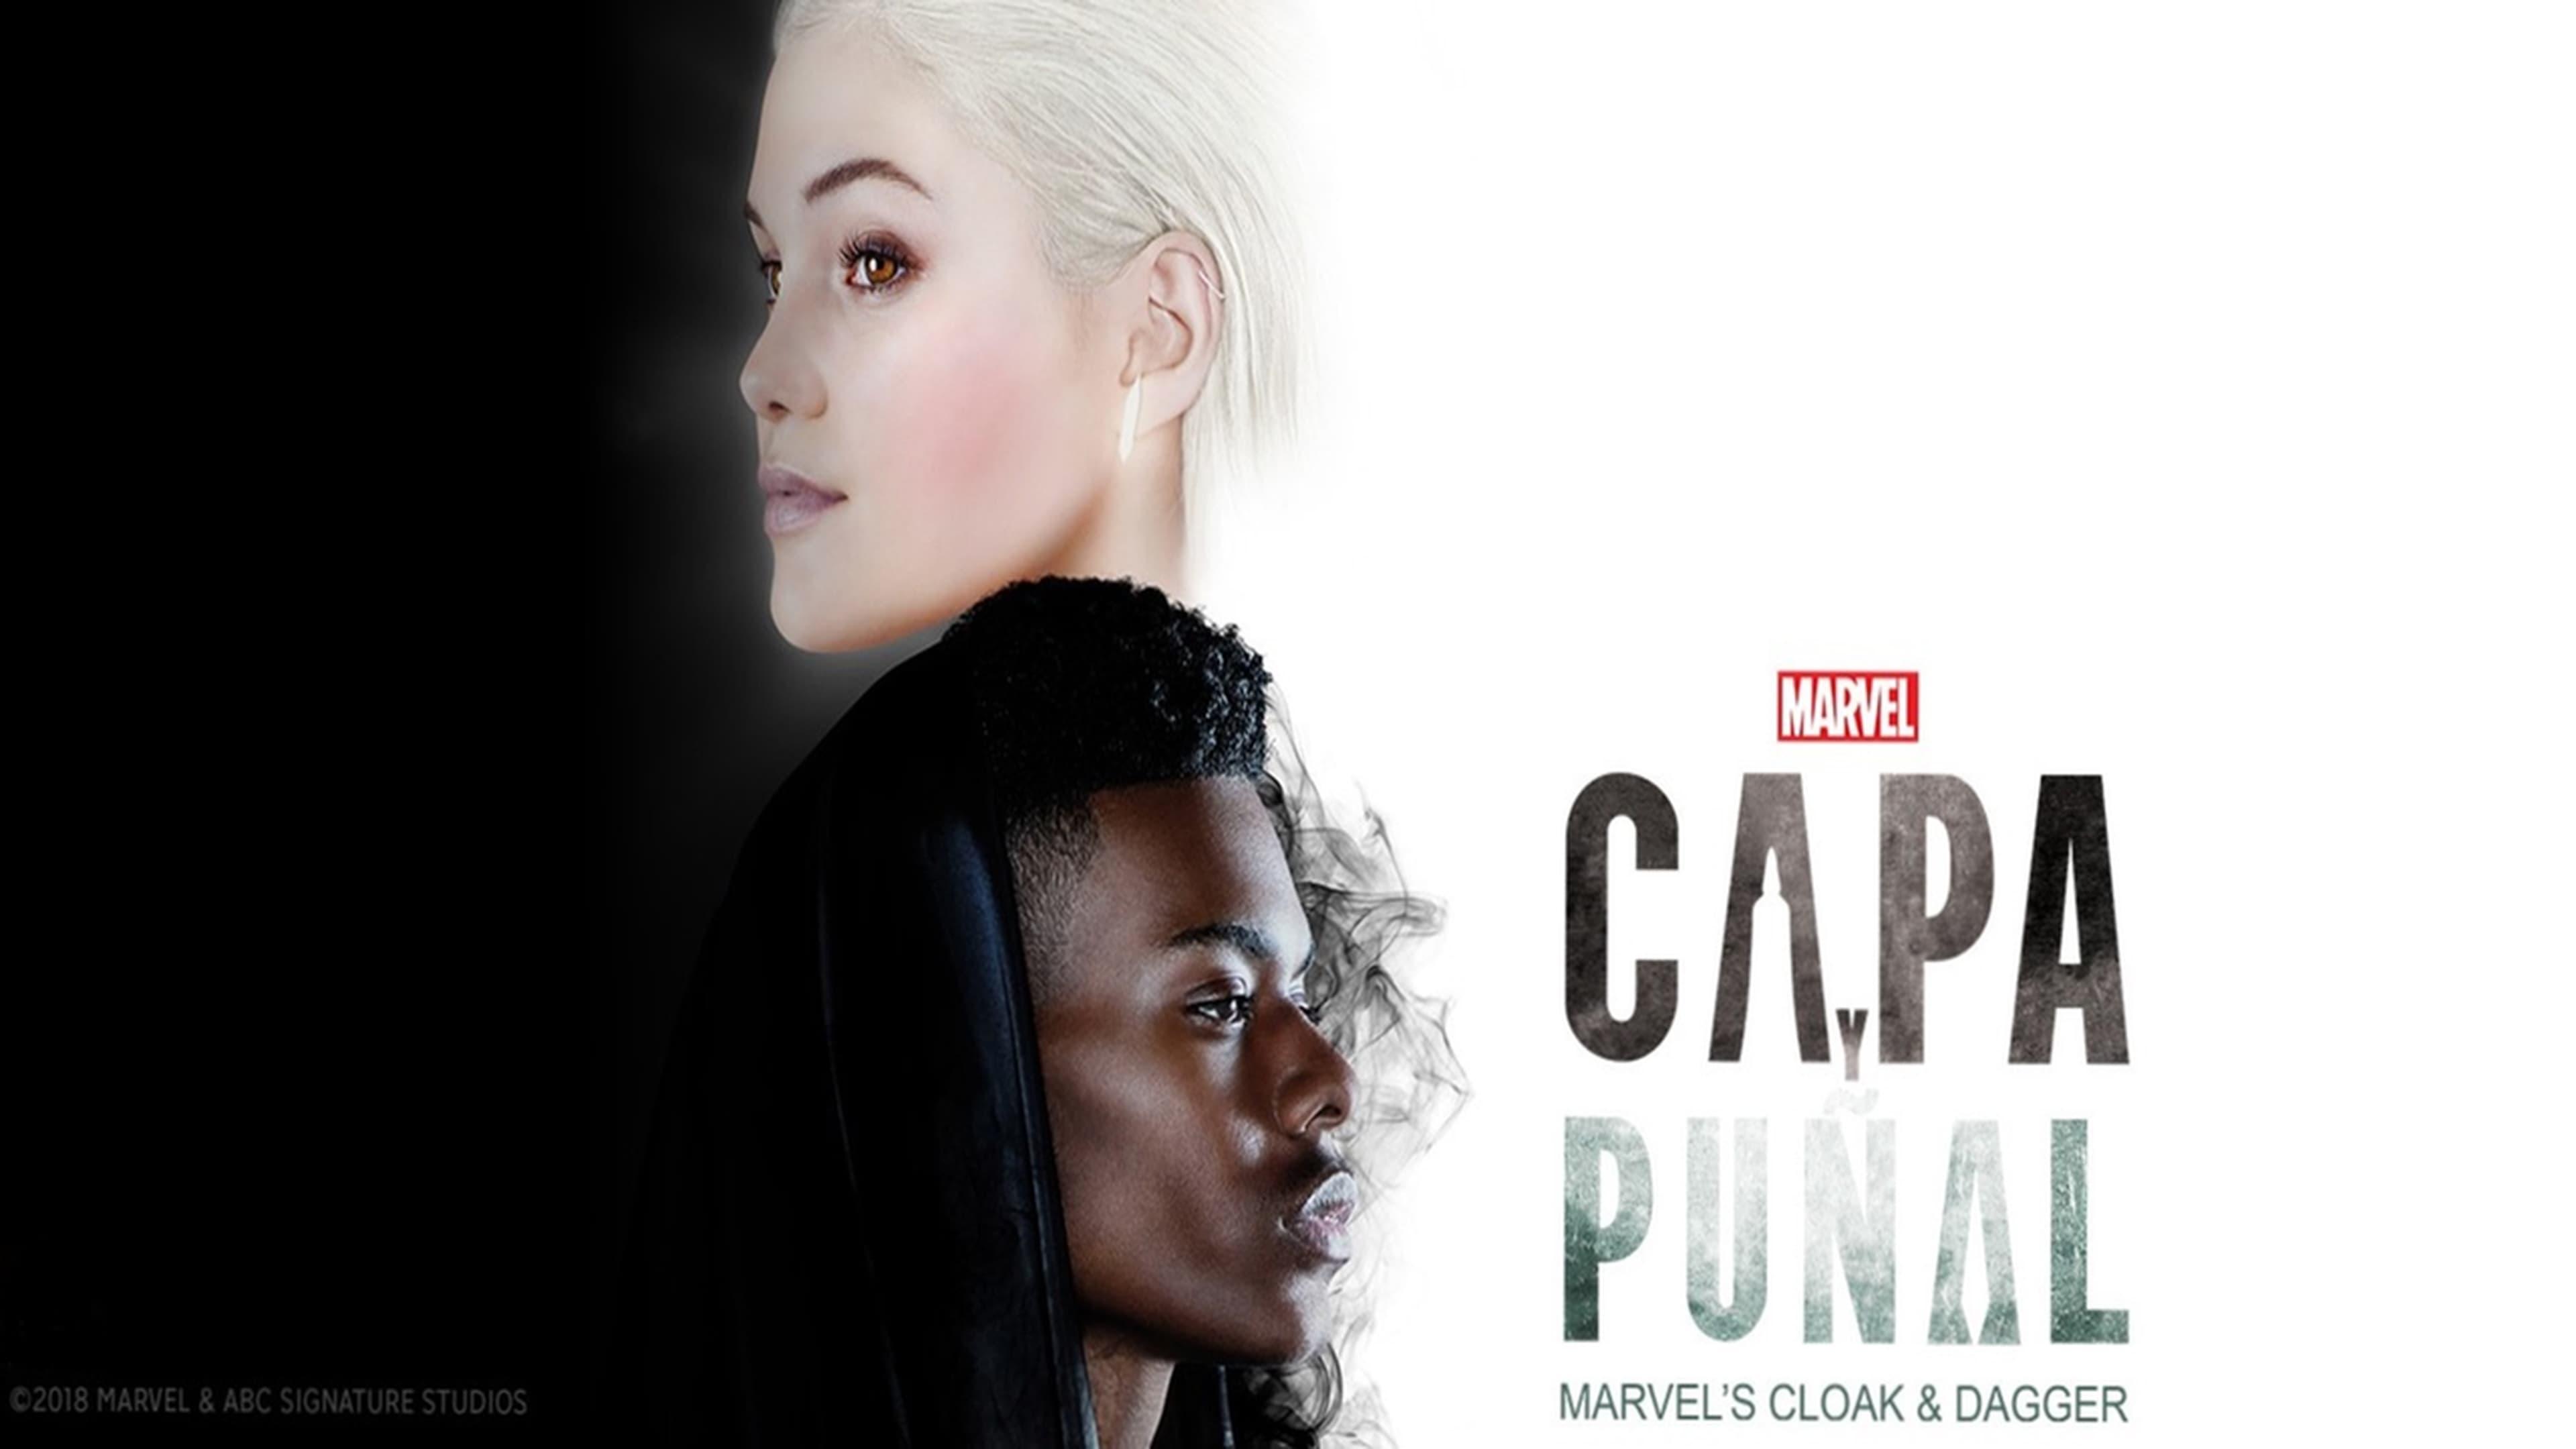 Marvel's Cloak & Dagger - Season 1